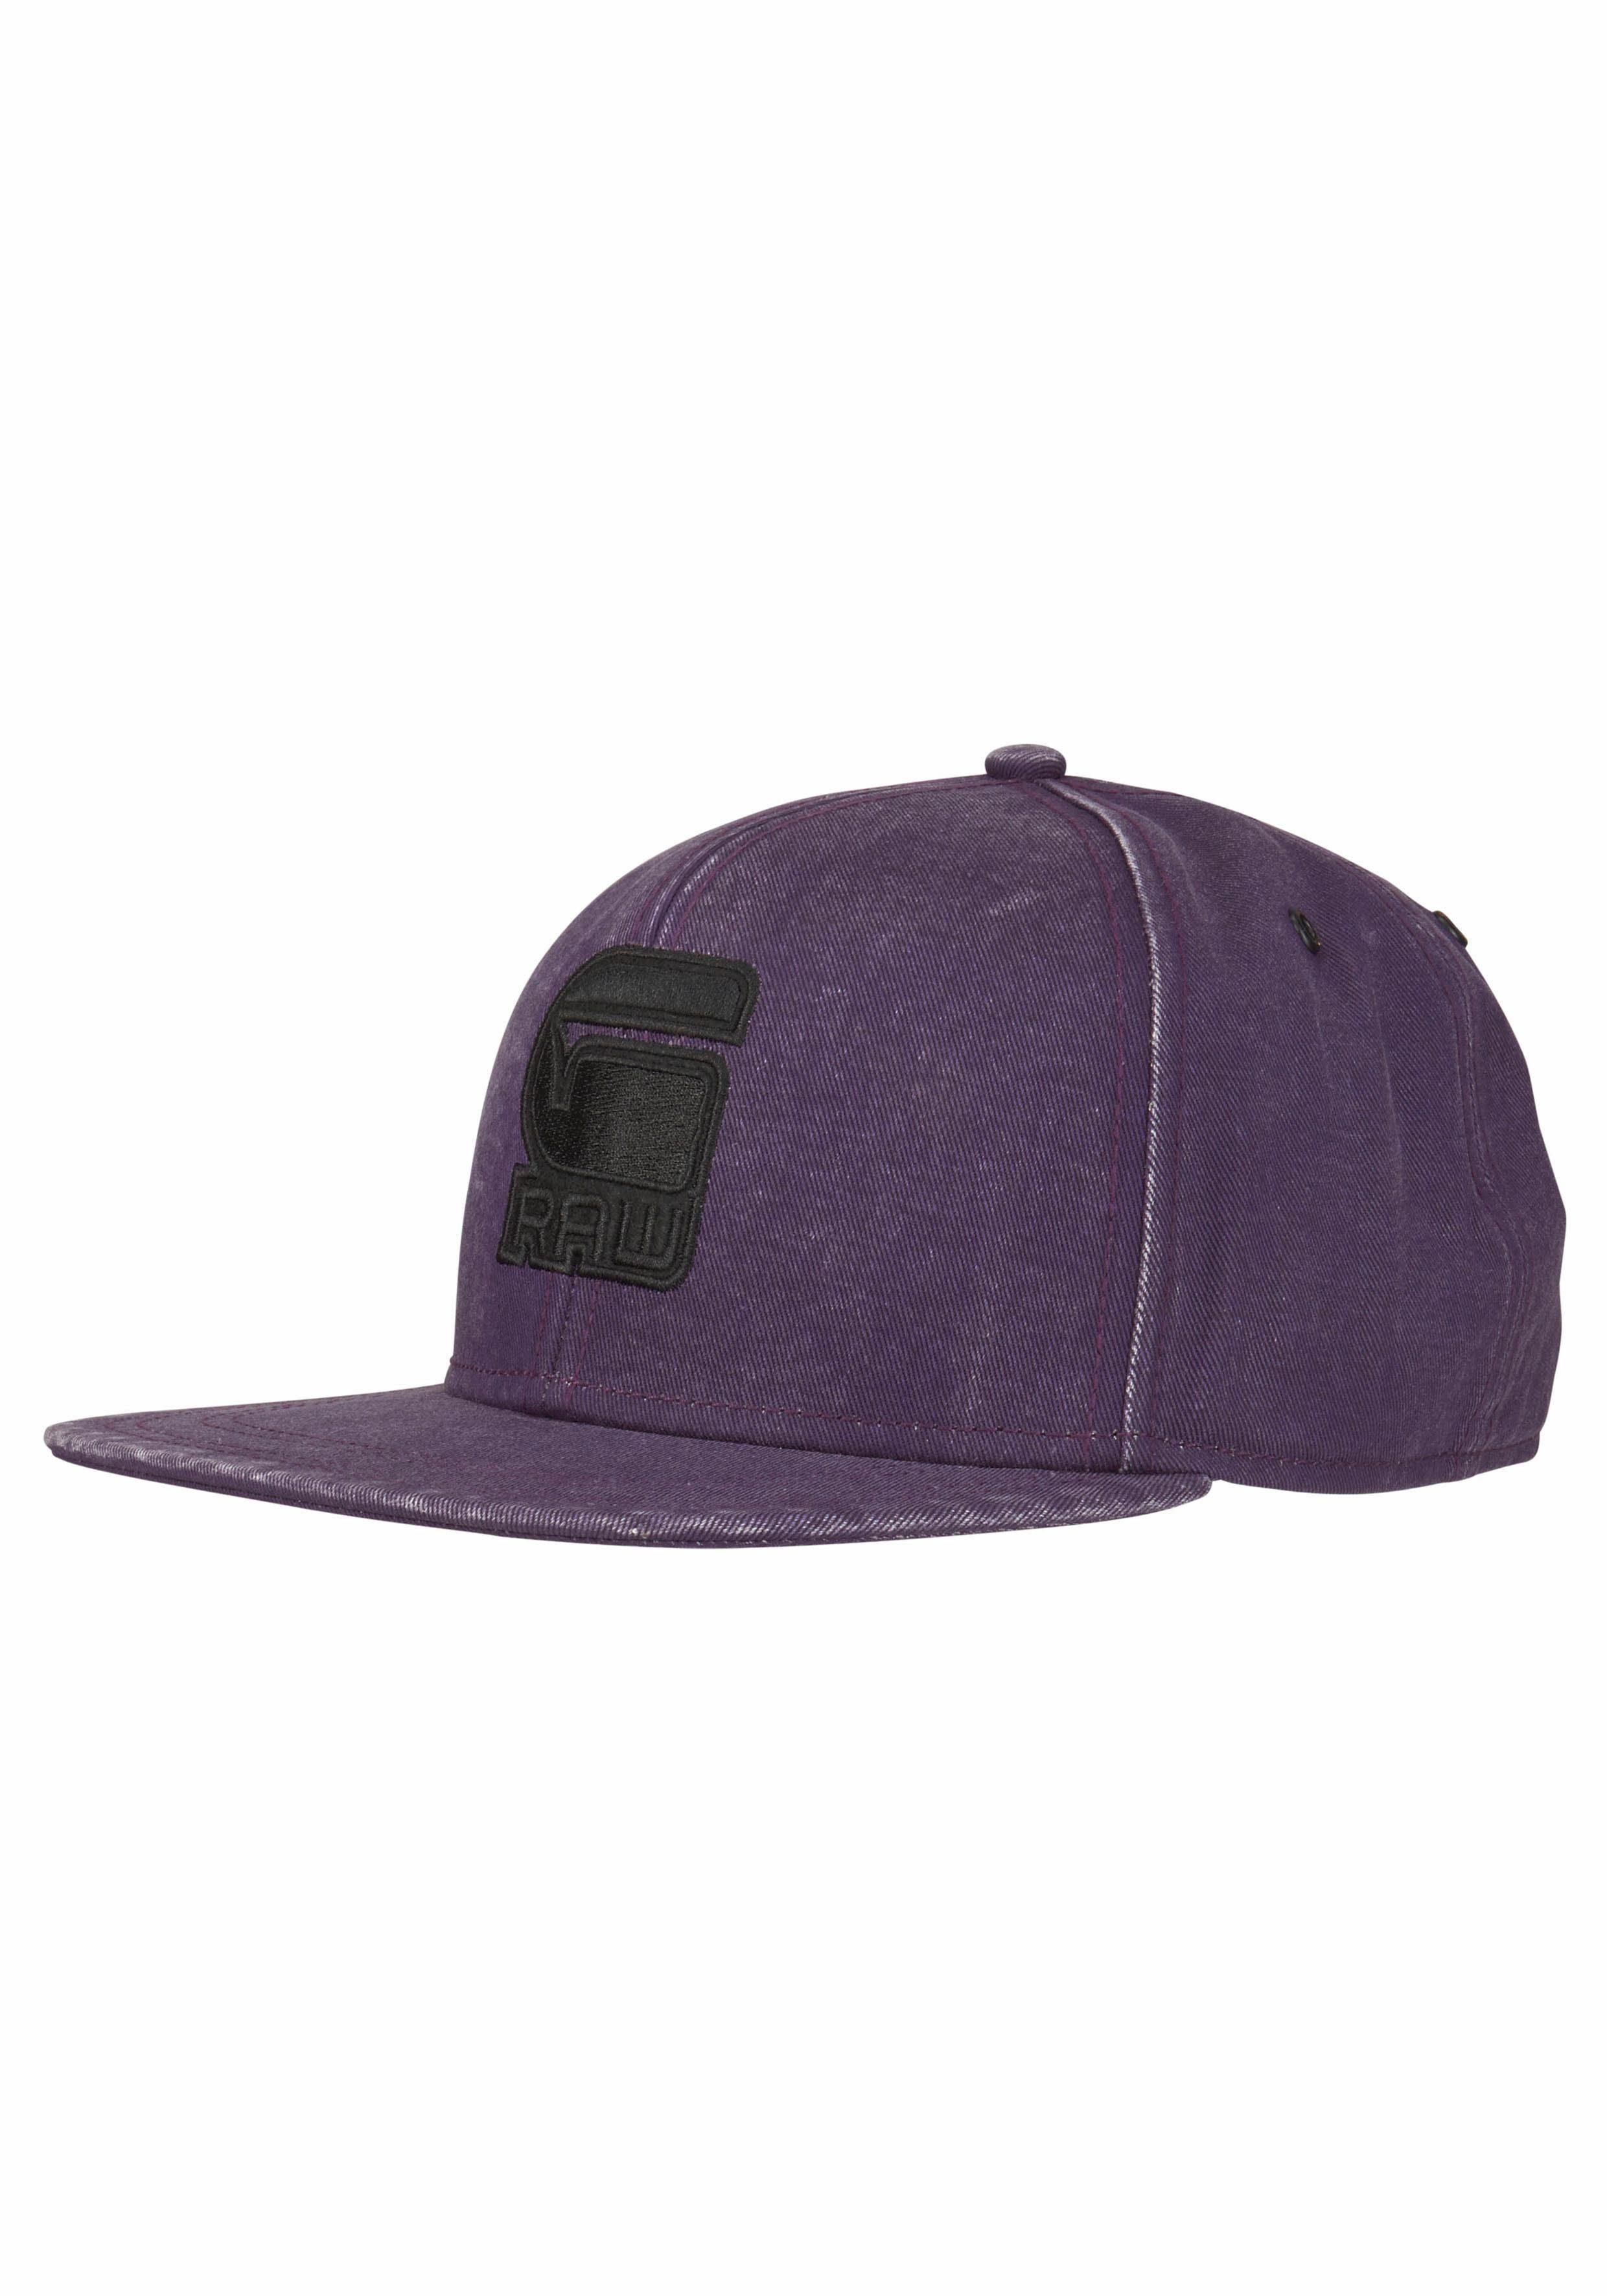 G-Star RAW Baseball Cap, mit Logo vorn